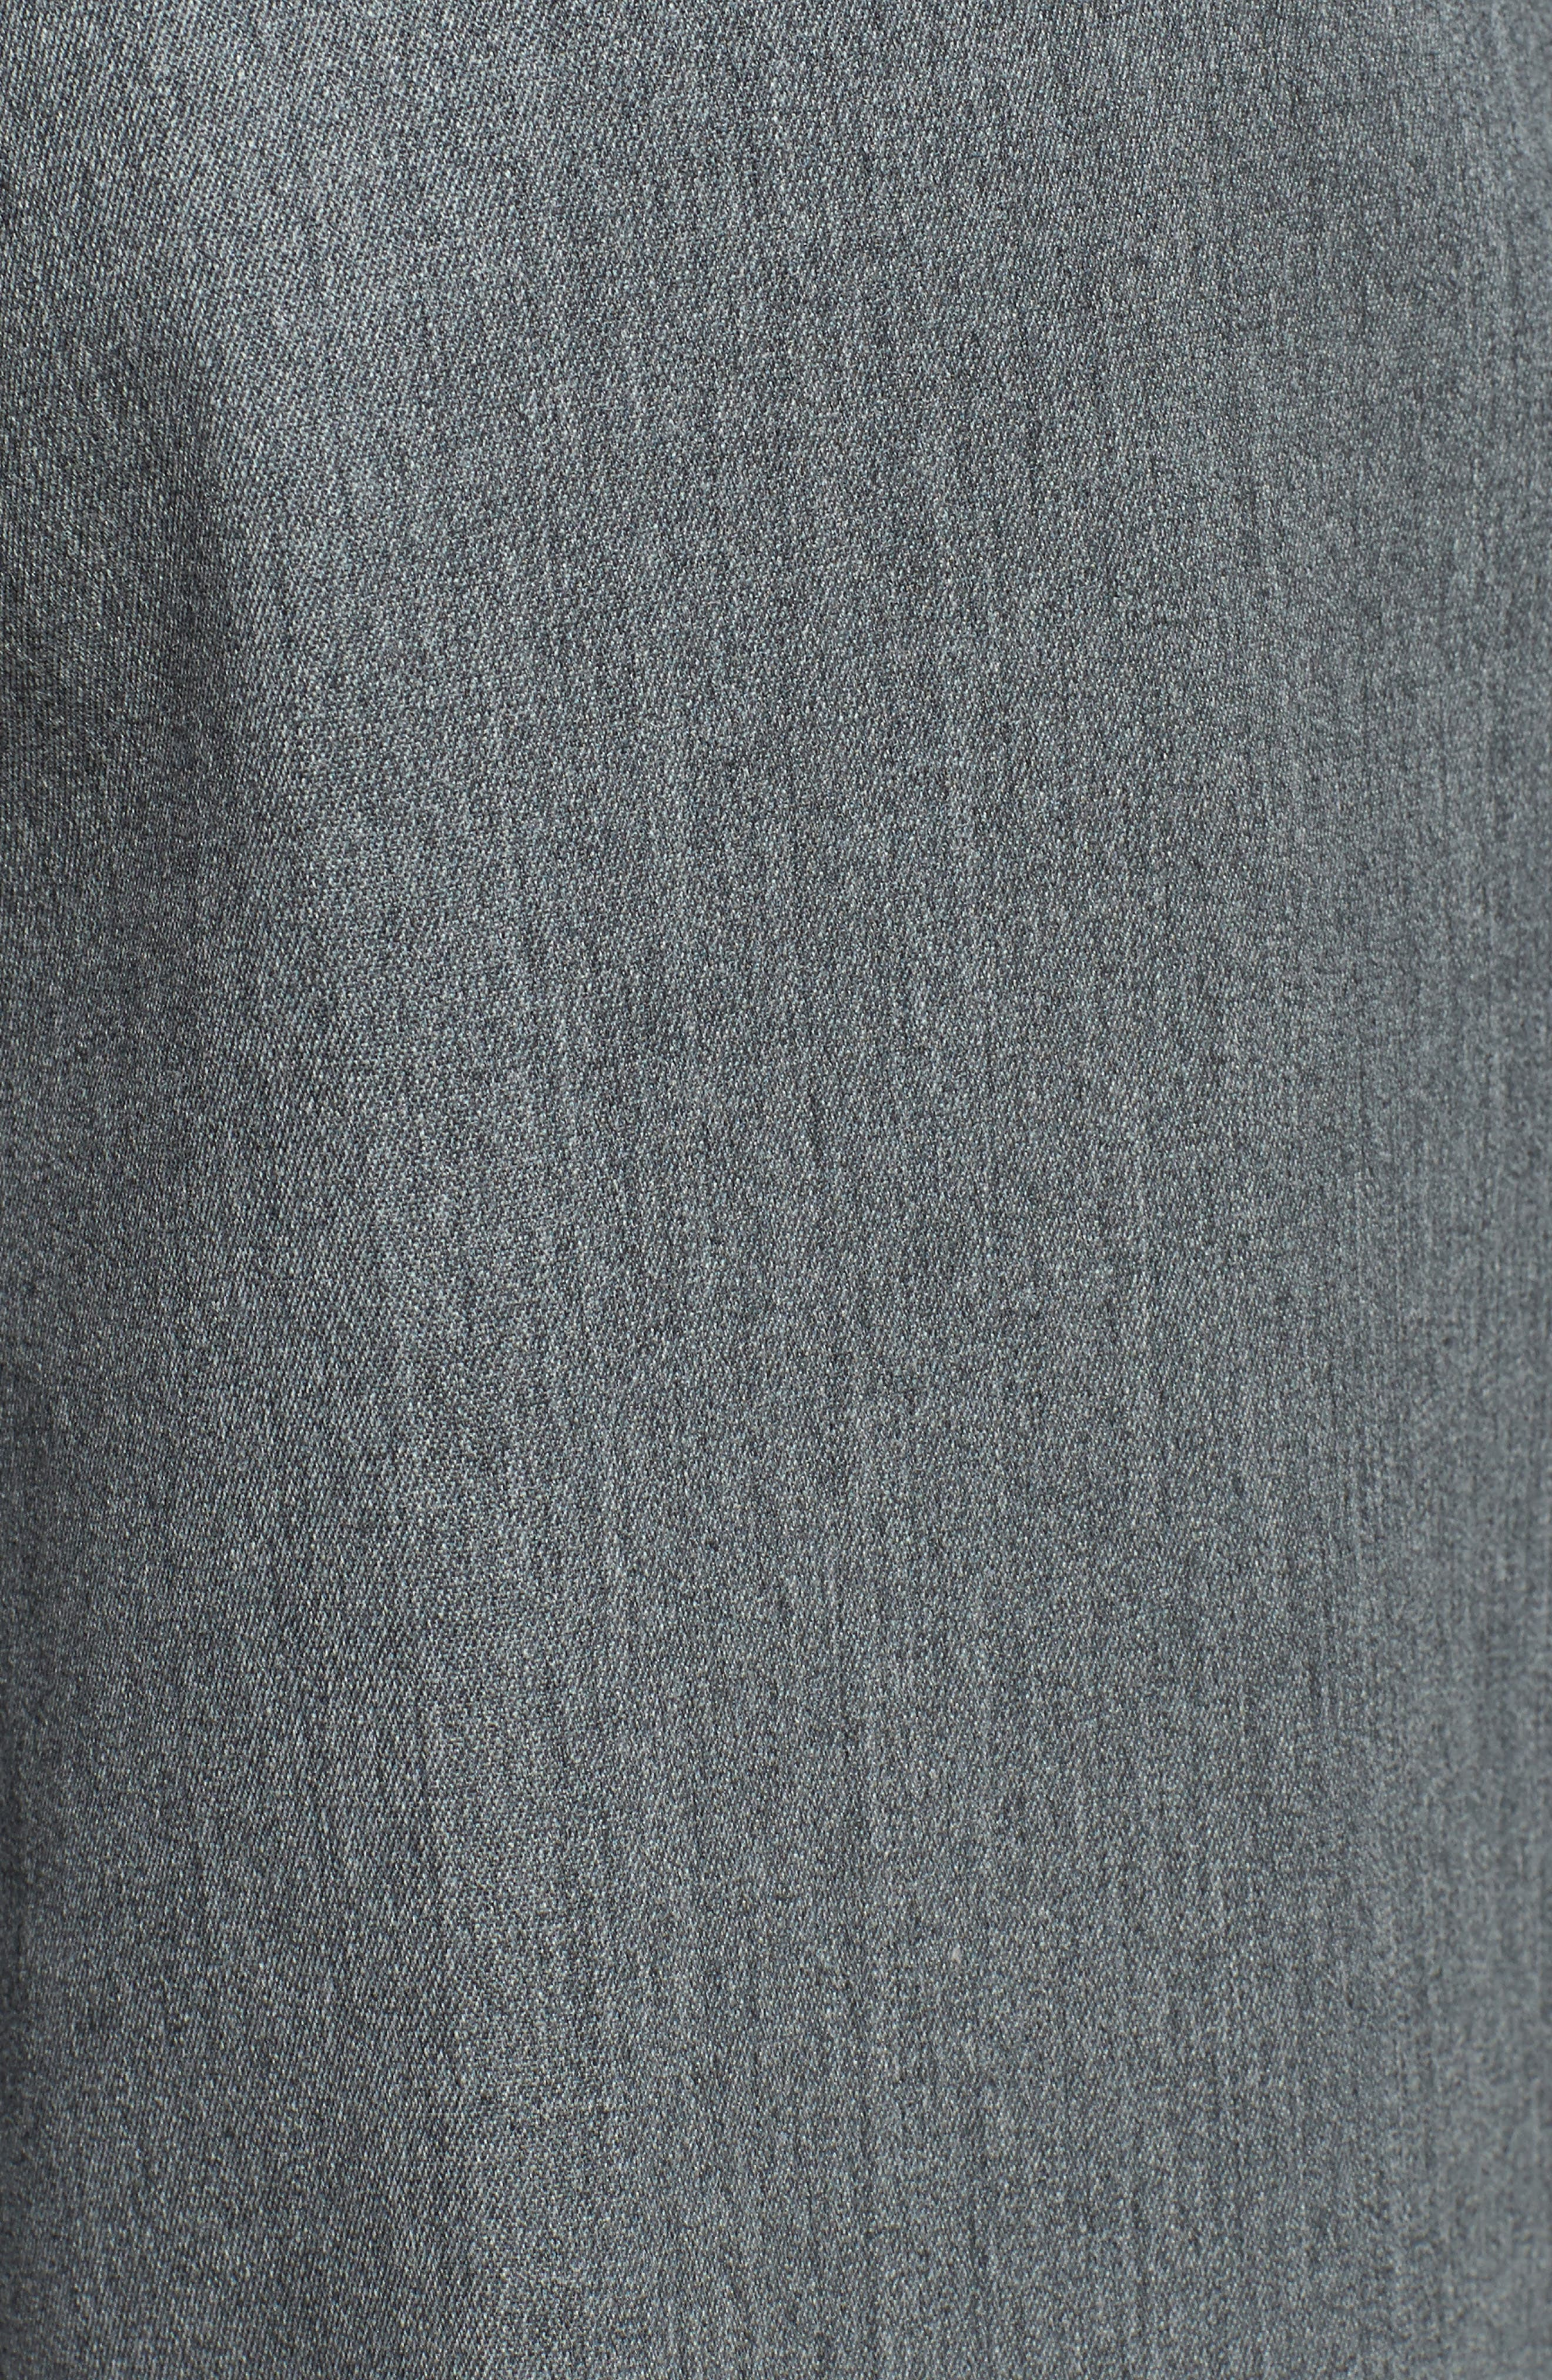 Self Sizer Waist Pleated Wool Gabardine Trousers,                             Alternate thumbnail 4, color,                             MEDIUM GREY